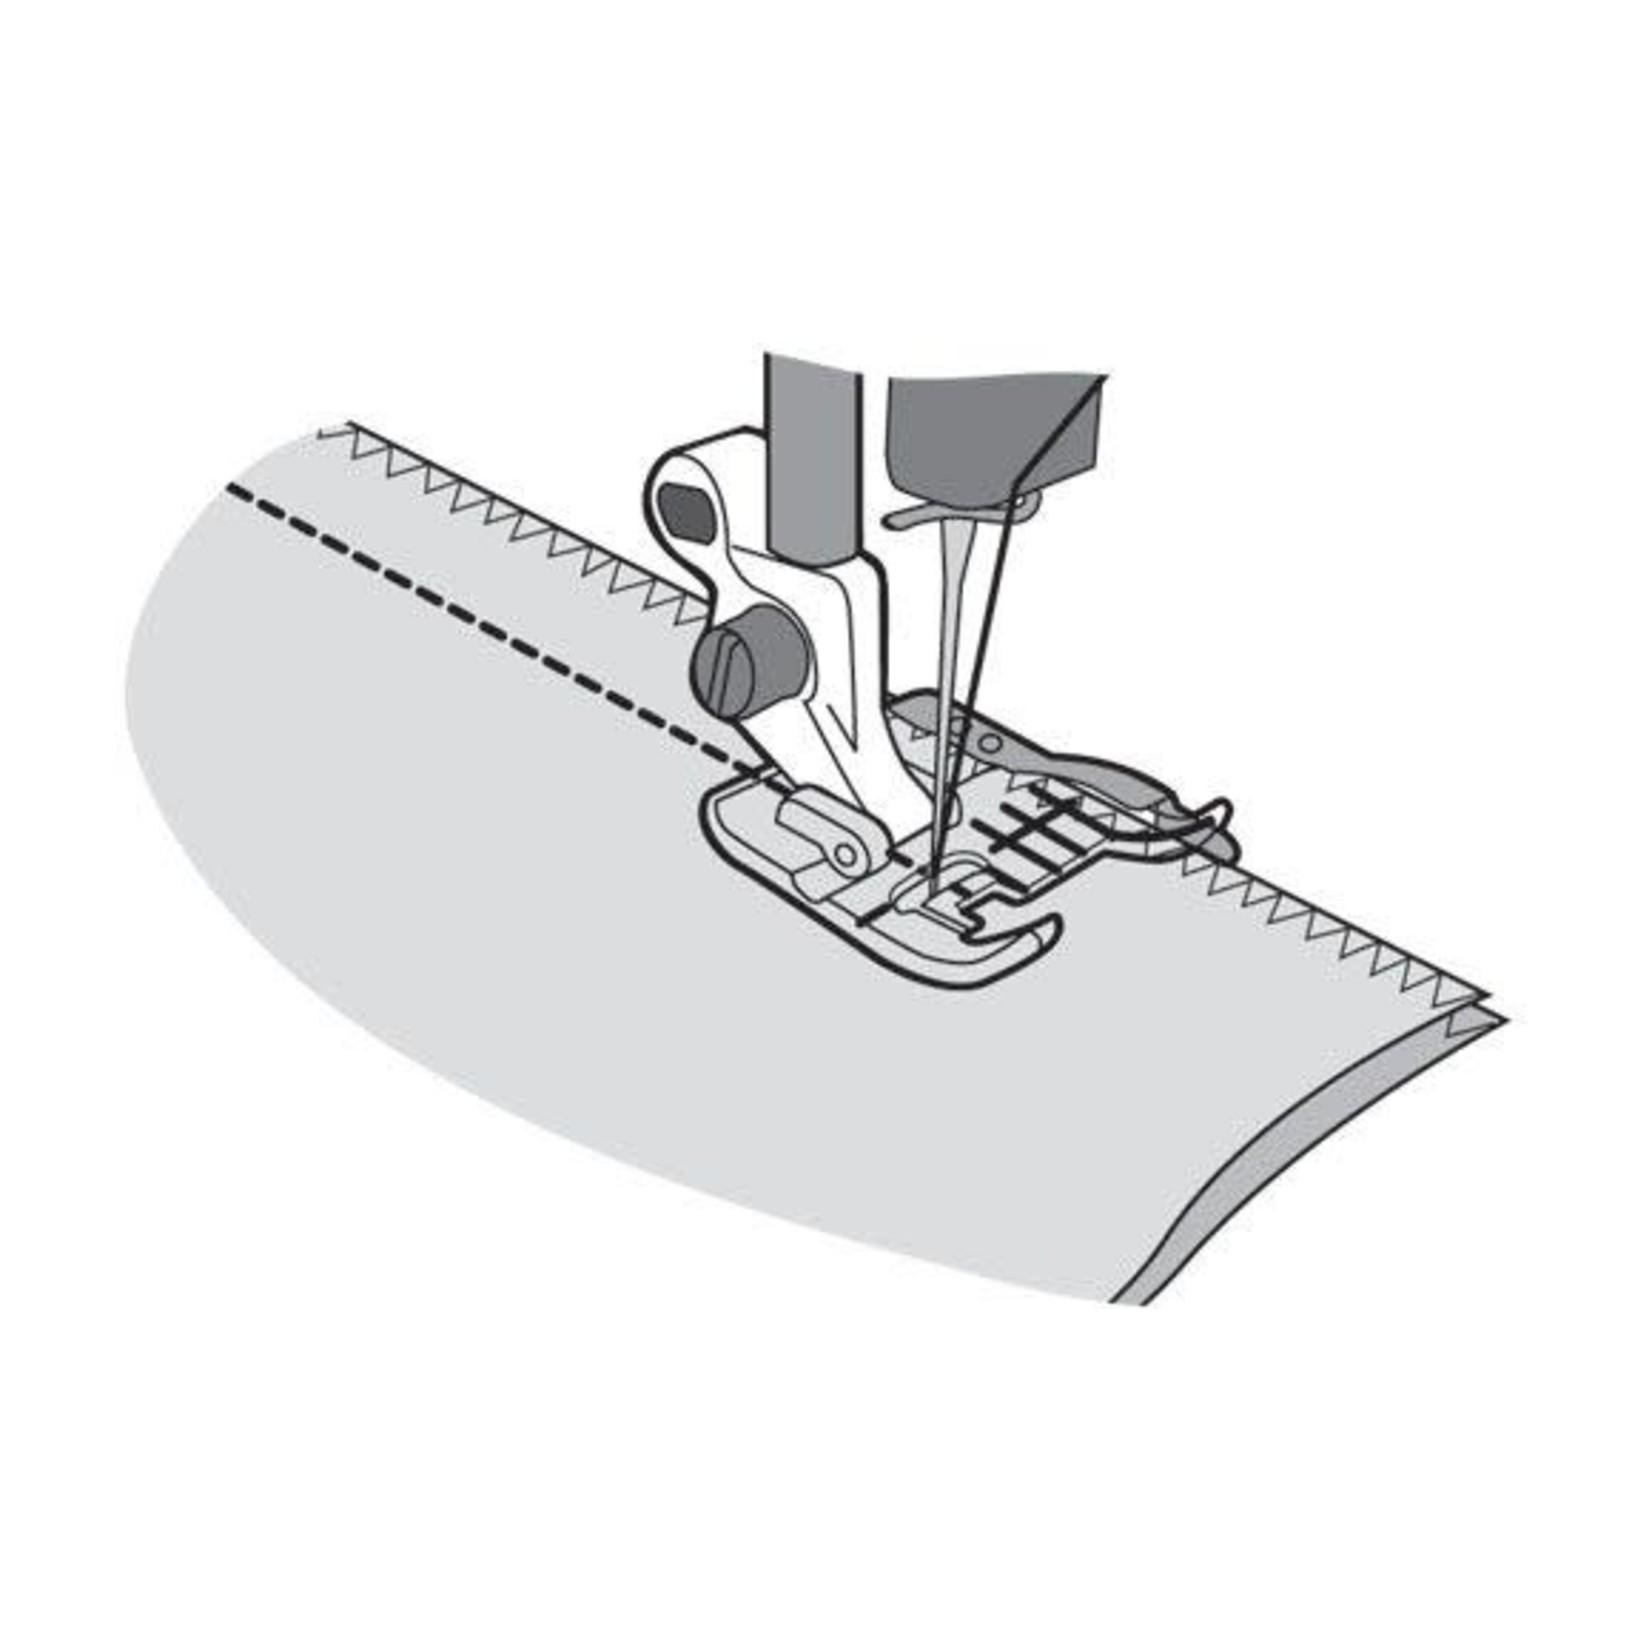 Husqvarna Viking CLEAR SEAM GUIDE FOOT HV BLISTER GRP 1-8